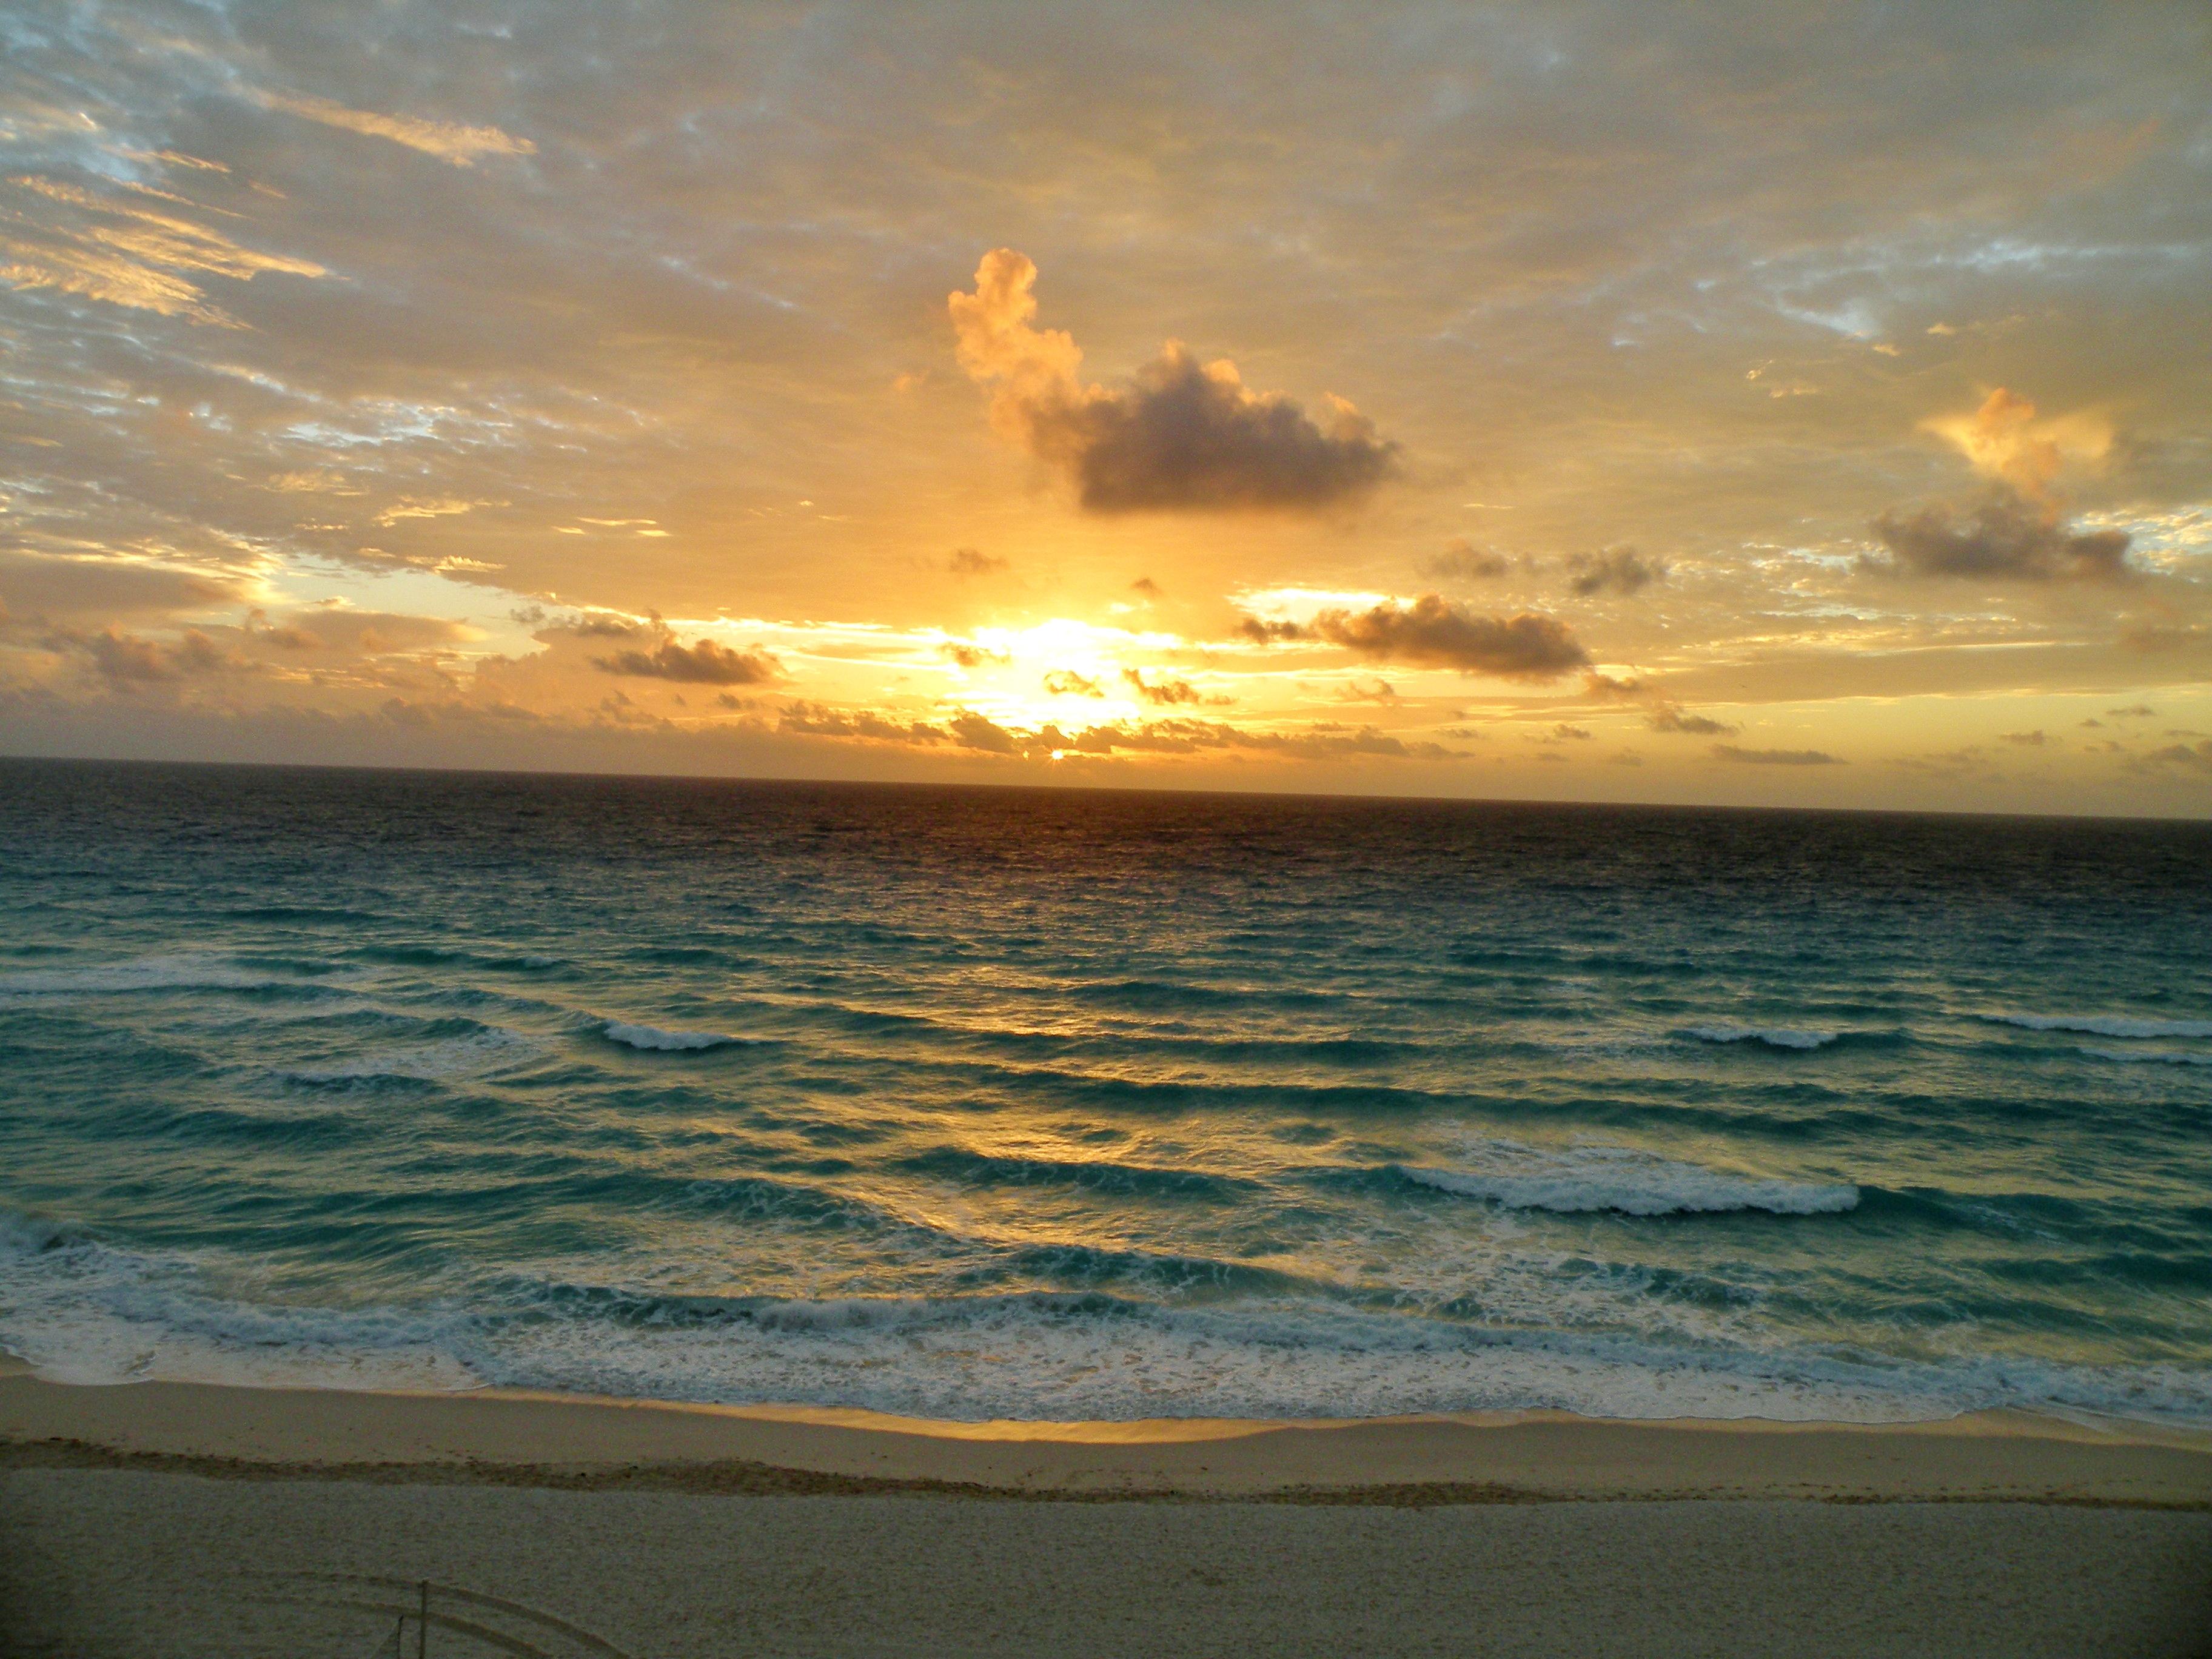 setting sun african caribbean - photo #6